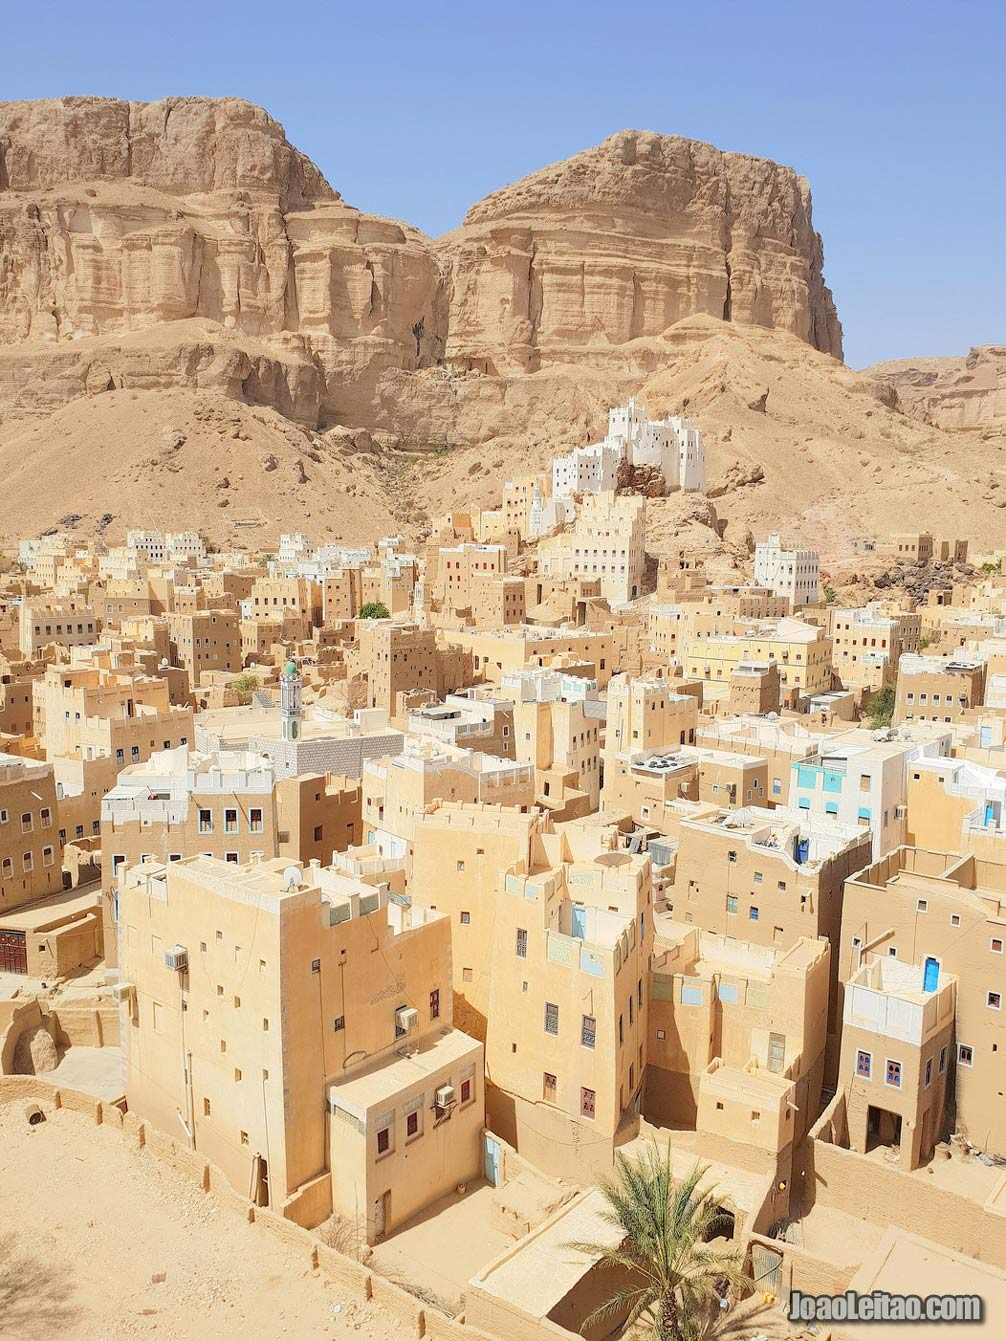 Sif in Yemen - Travel Blog